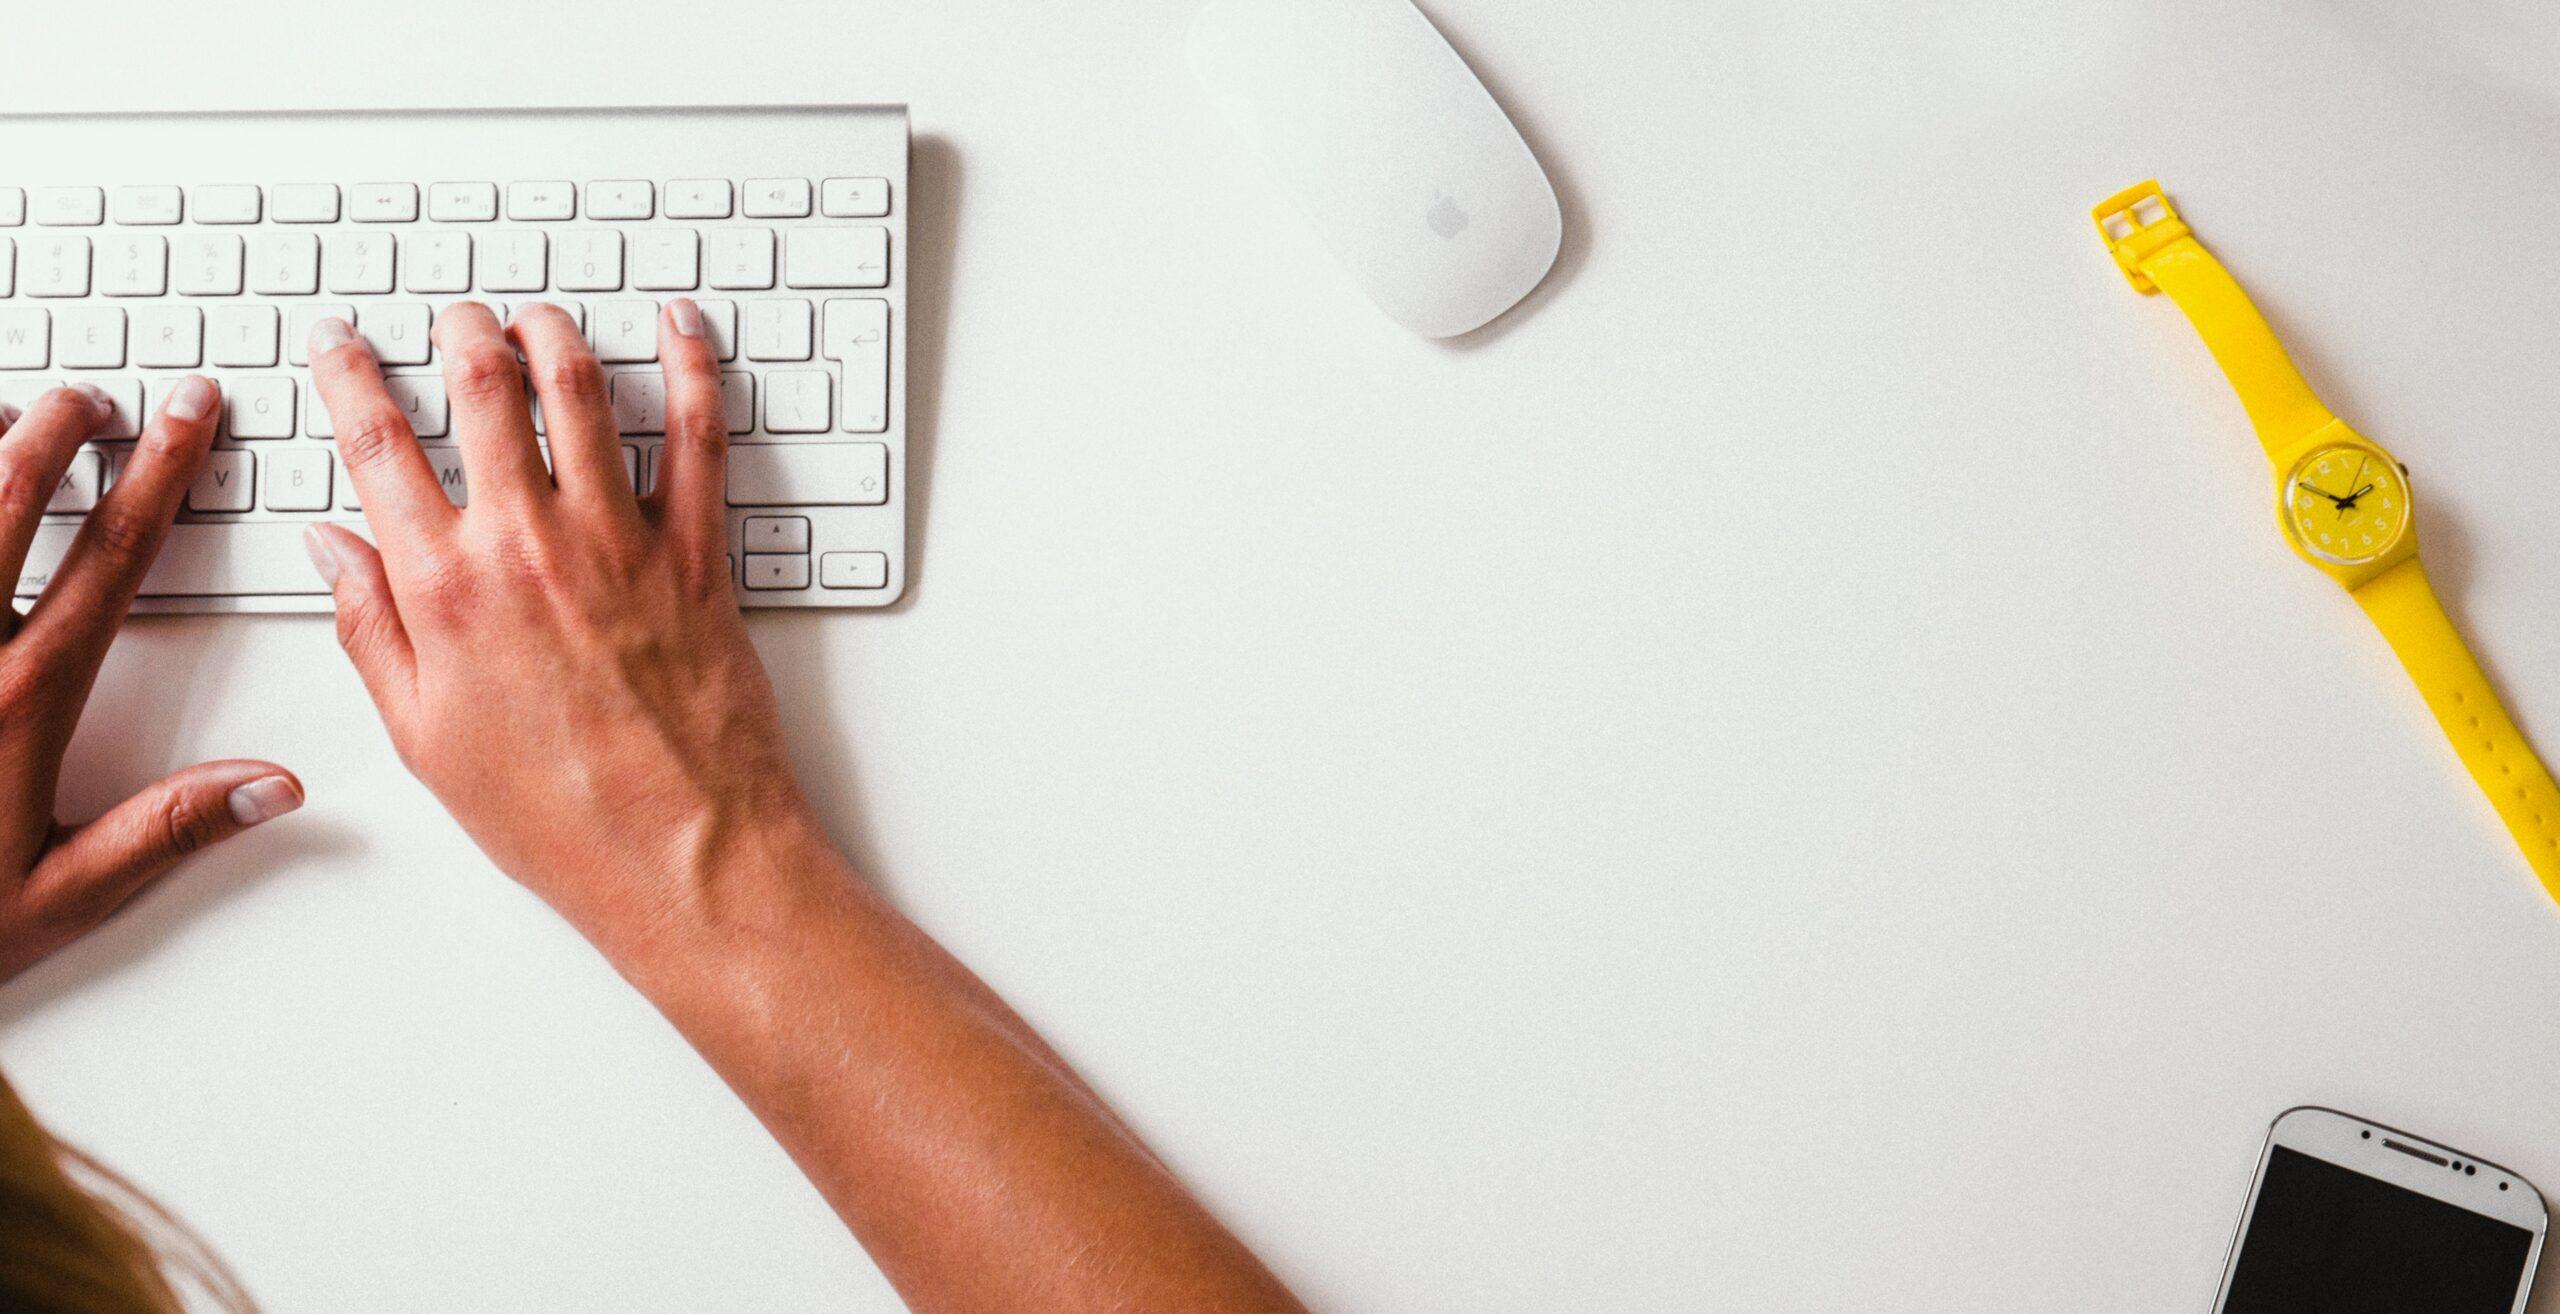 encuentre empleo en redes sociales scaled ElMetro.com.co